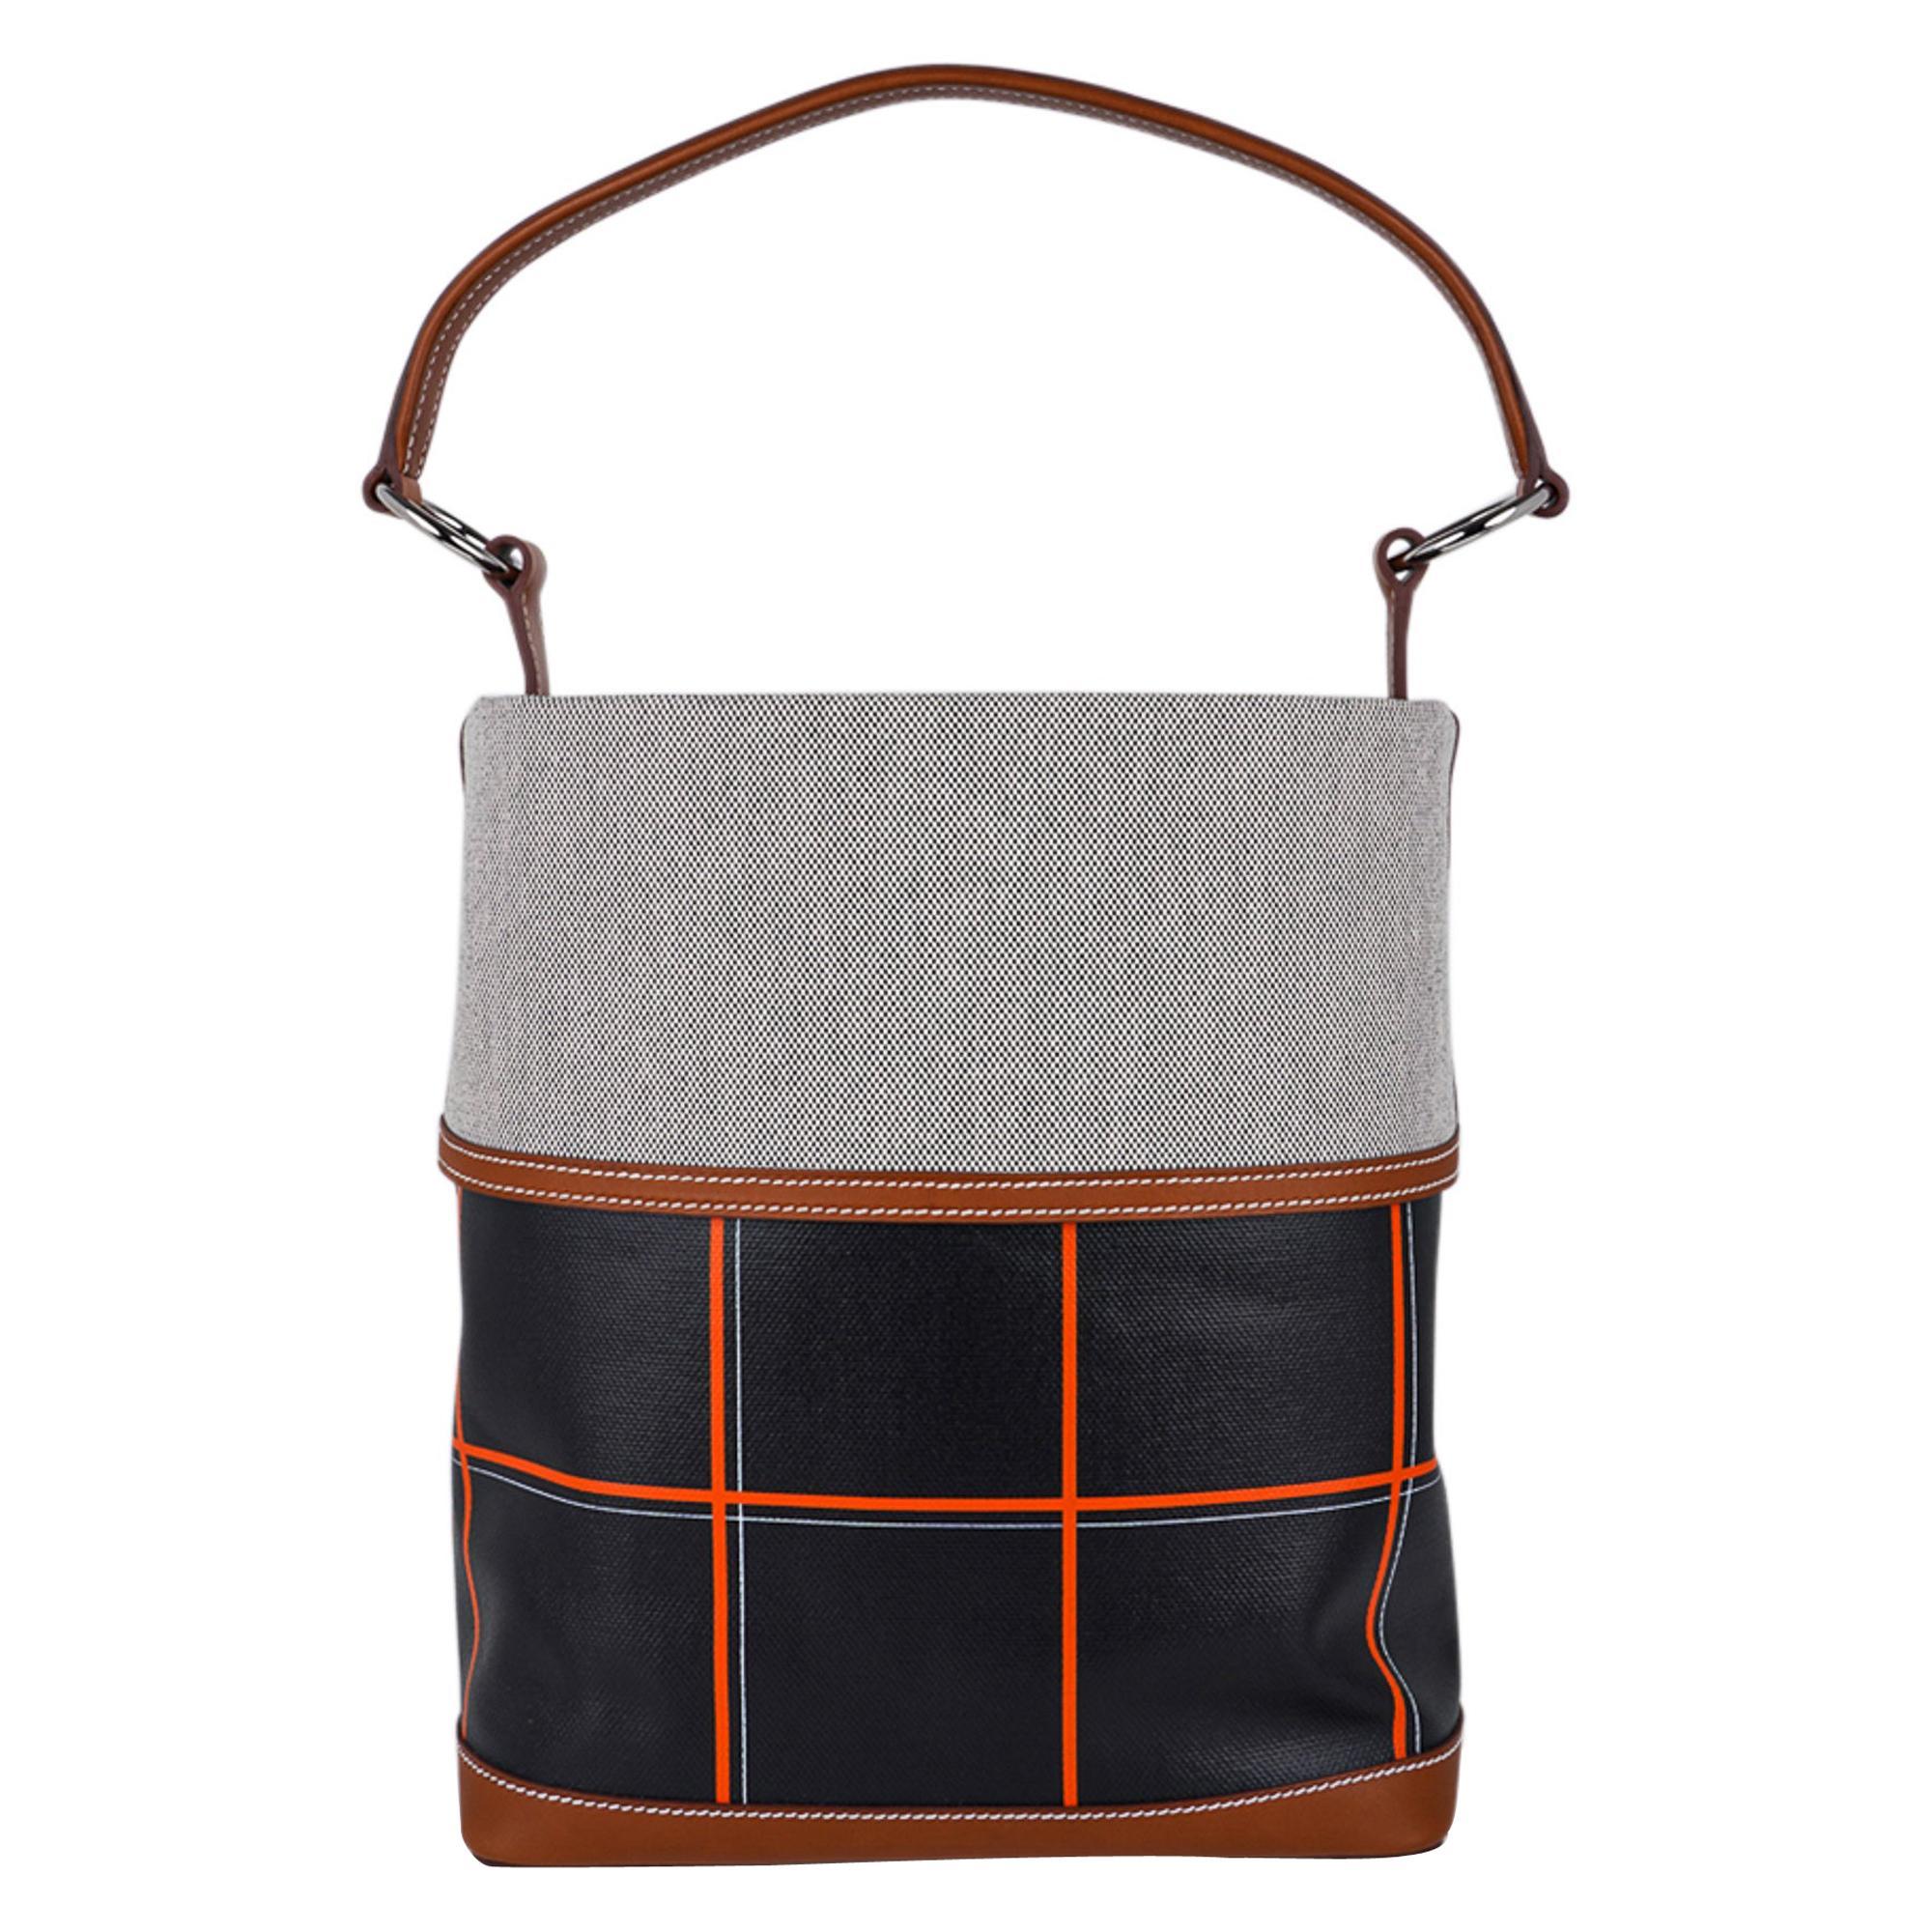 Hermes Bag Col Roule Noir Toile Berline / Barenia Leather Tote New